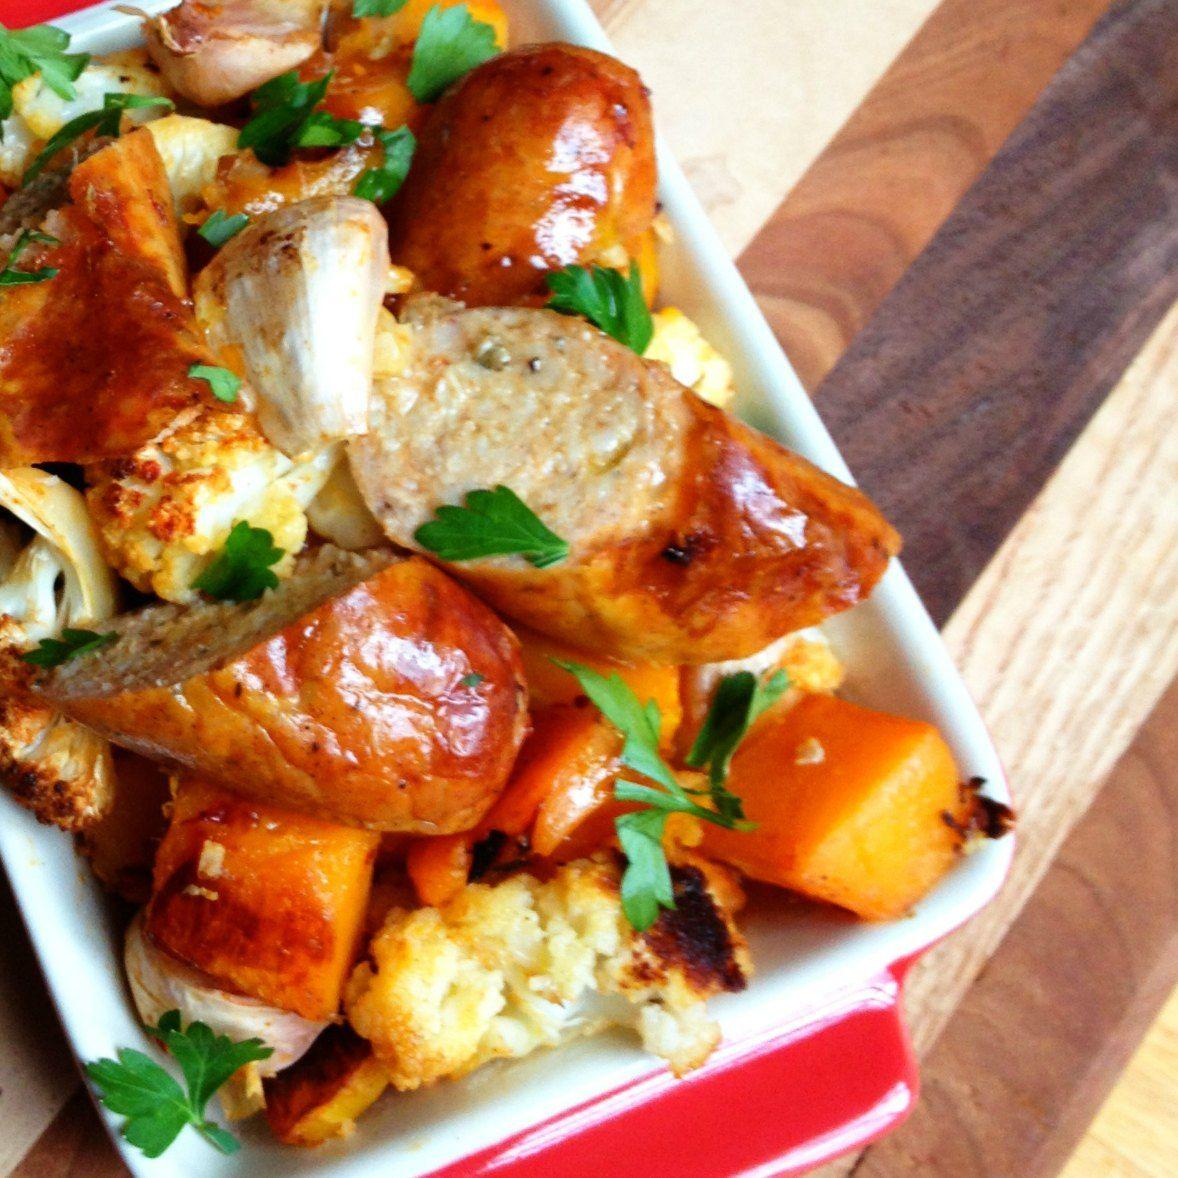 Garlic Roasted Sausage and Winter Vegetables - The Lemon Bowl